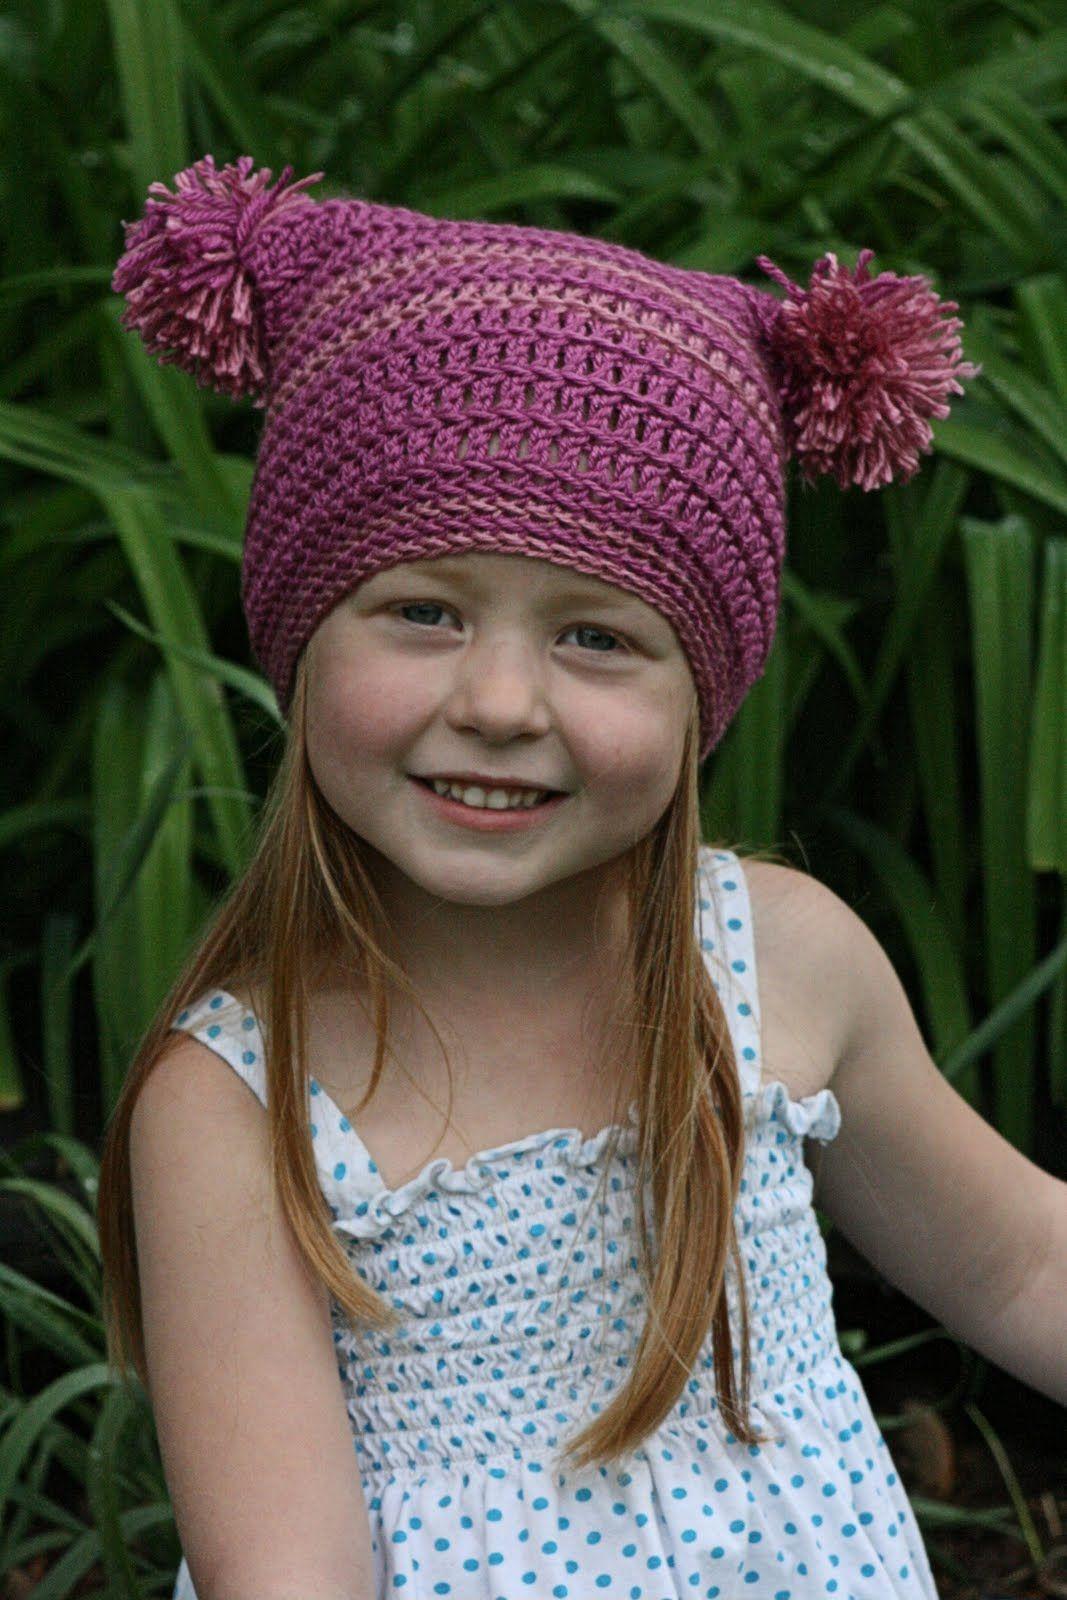 Double Pom Pom Hat Free Crochet Pattern for Beginner  Freepattern  Crochet   Hat 01bf8eda0c7